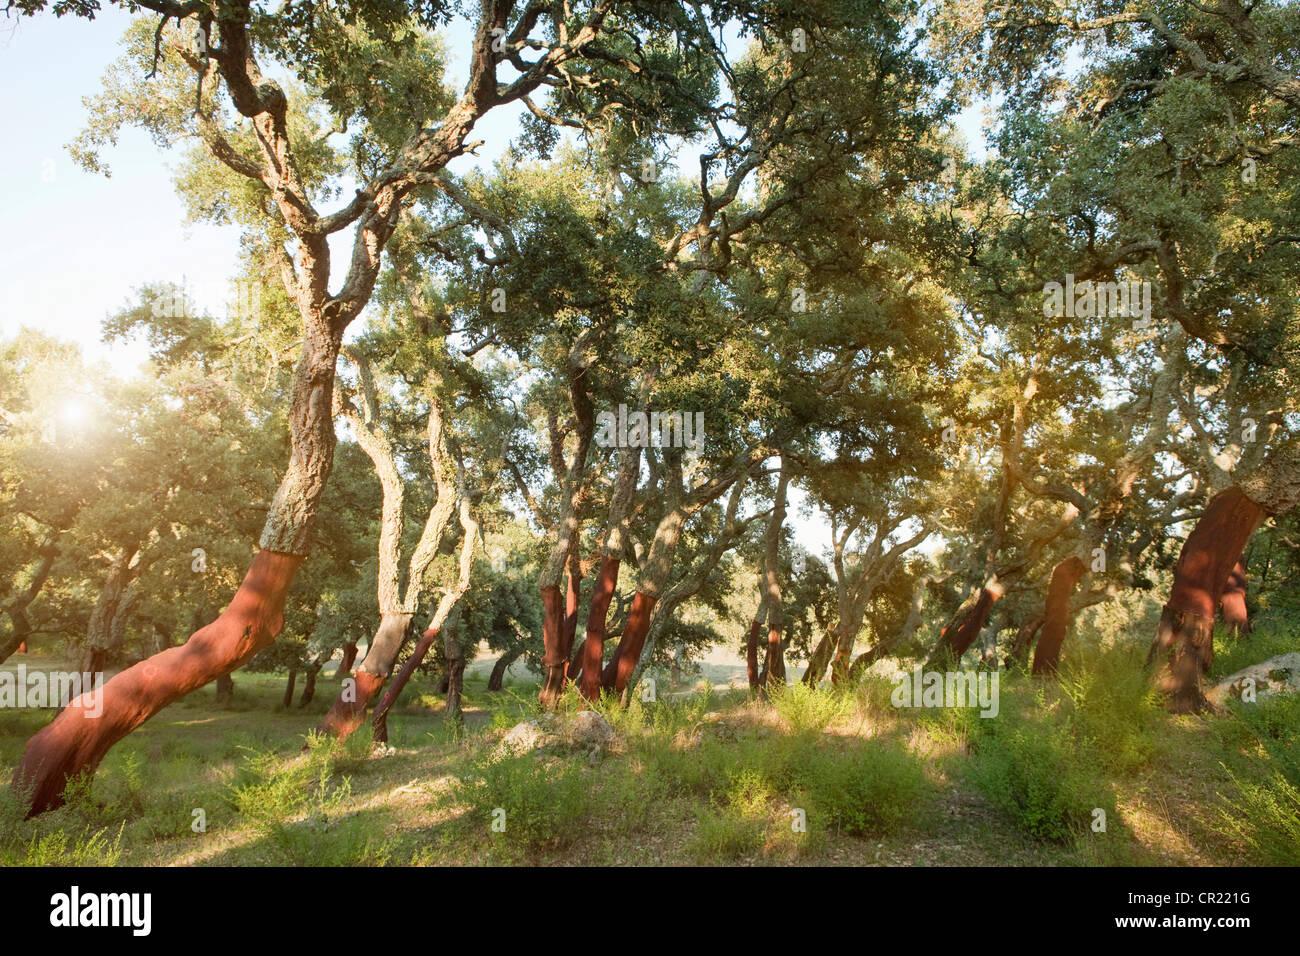 Alcornoques pelados en la selva rural Imagen De Stock